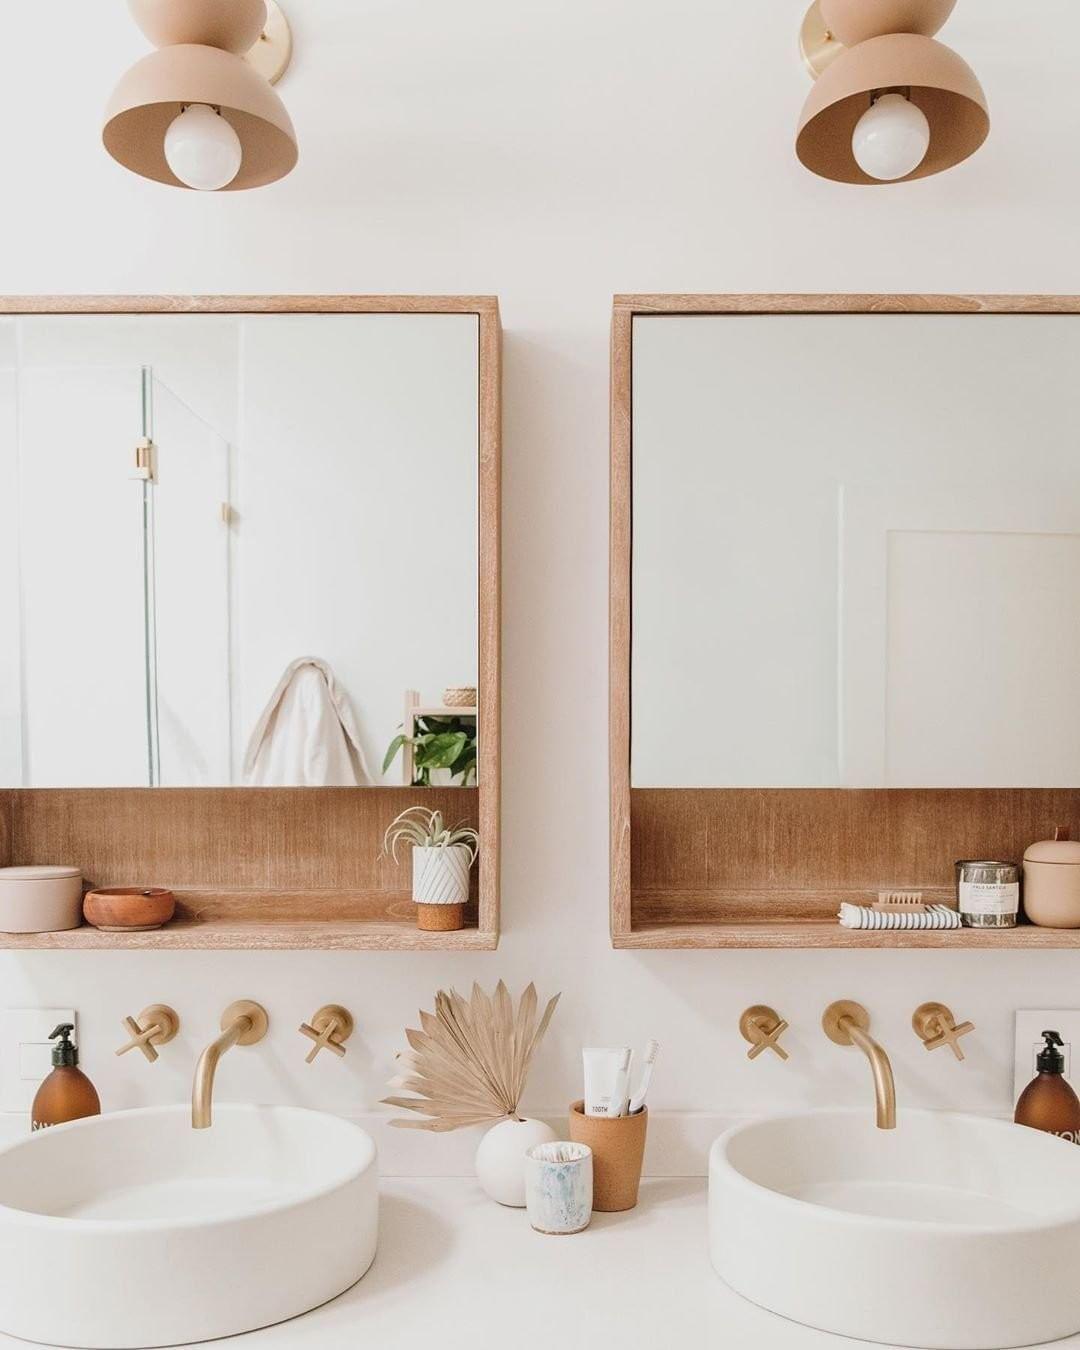 bathroom wall decor kohls #bathroom niche decor #bathroom decor